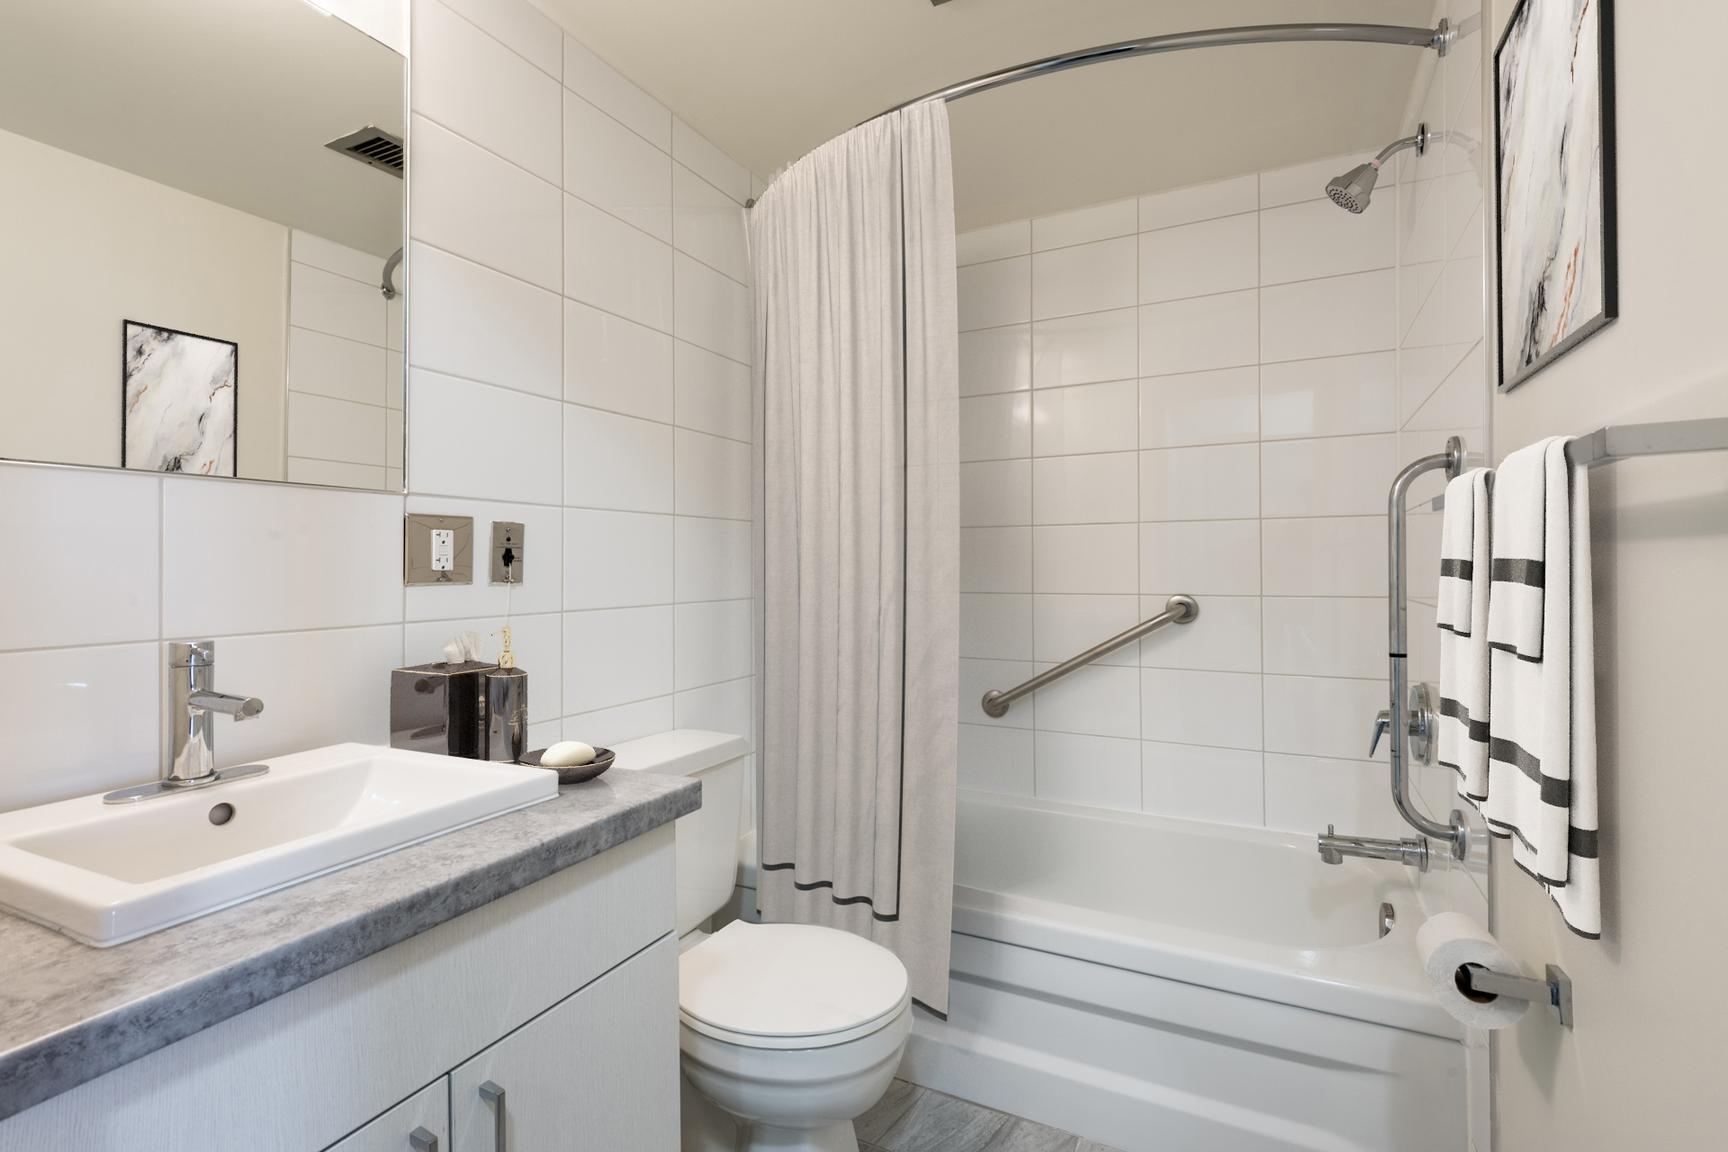 1 bedroom Apartments for rent in Laval at Le Quatre Cent - Photo 16 - RentQuebecApartments – L407183